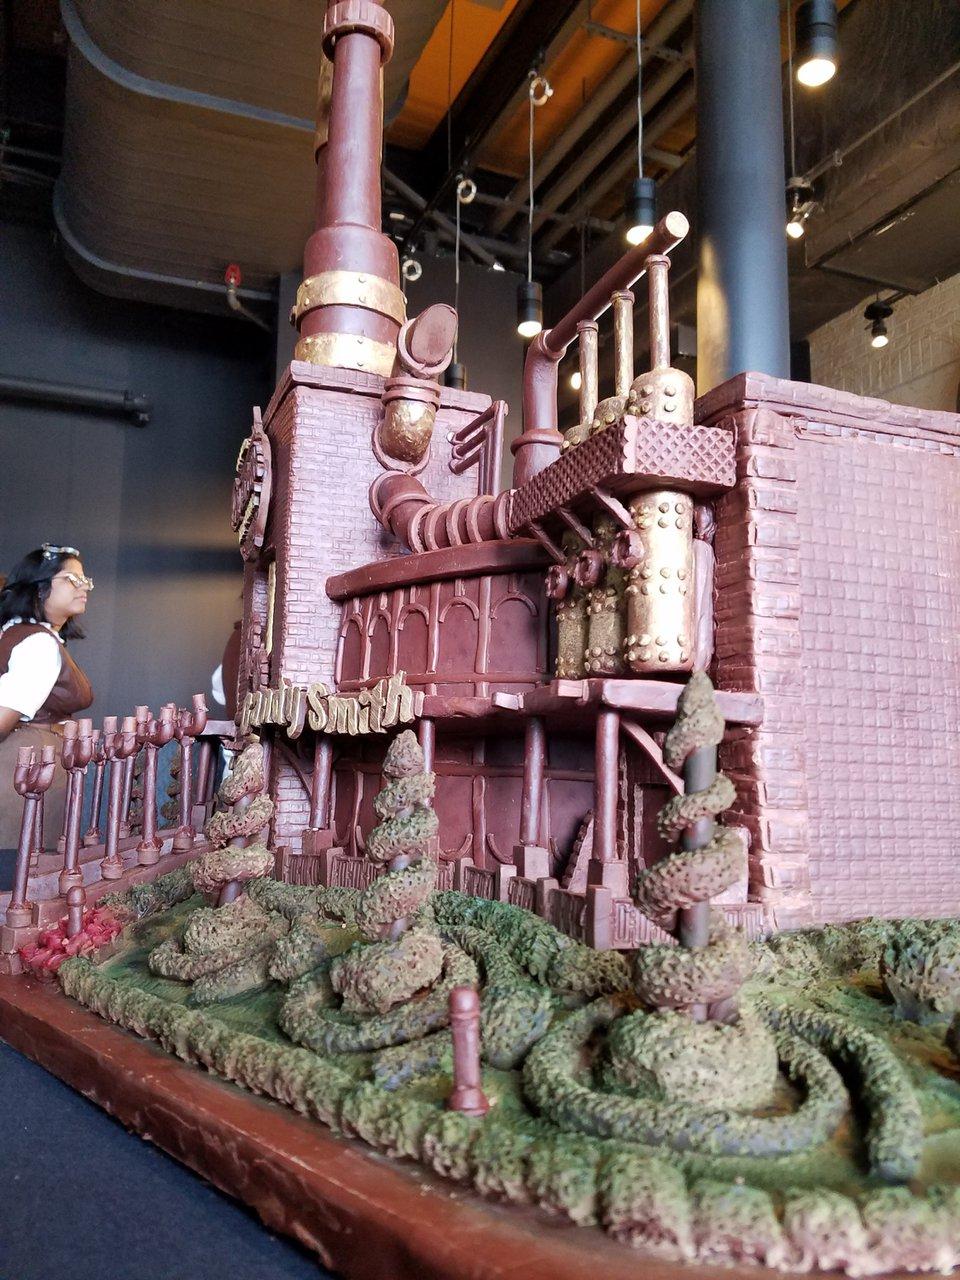 Toothsome Chocolate Factory photo 20161028_145317.jpg